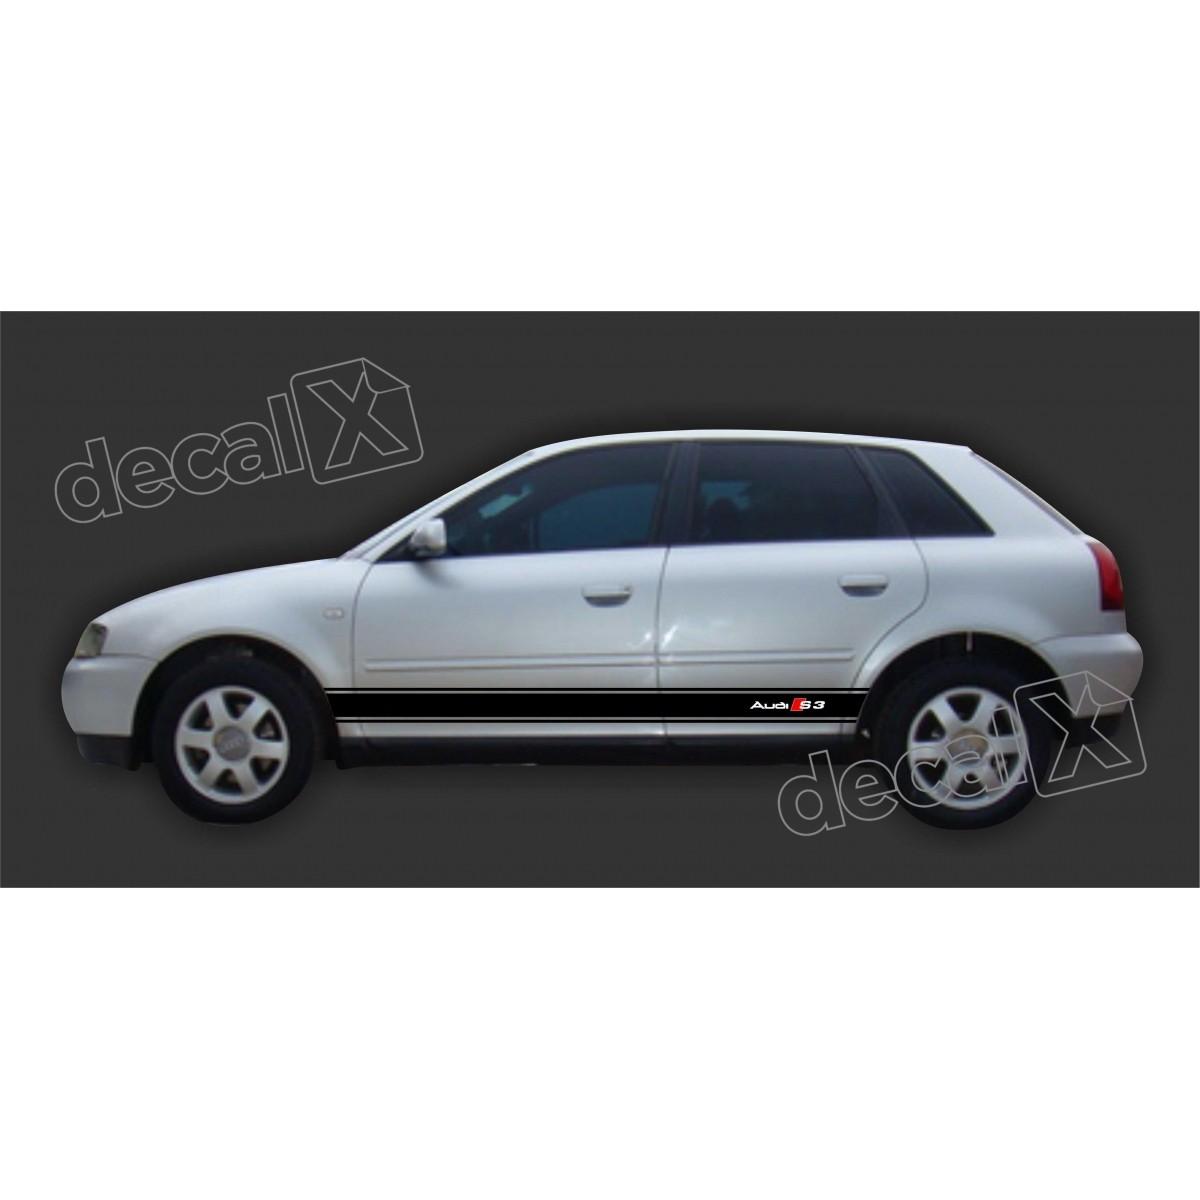 Adesivo Audi A3 Lateral A38